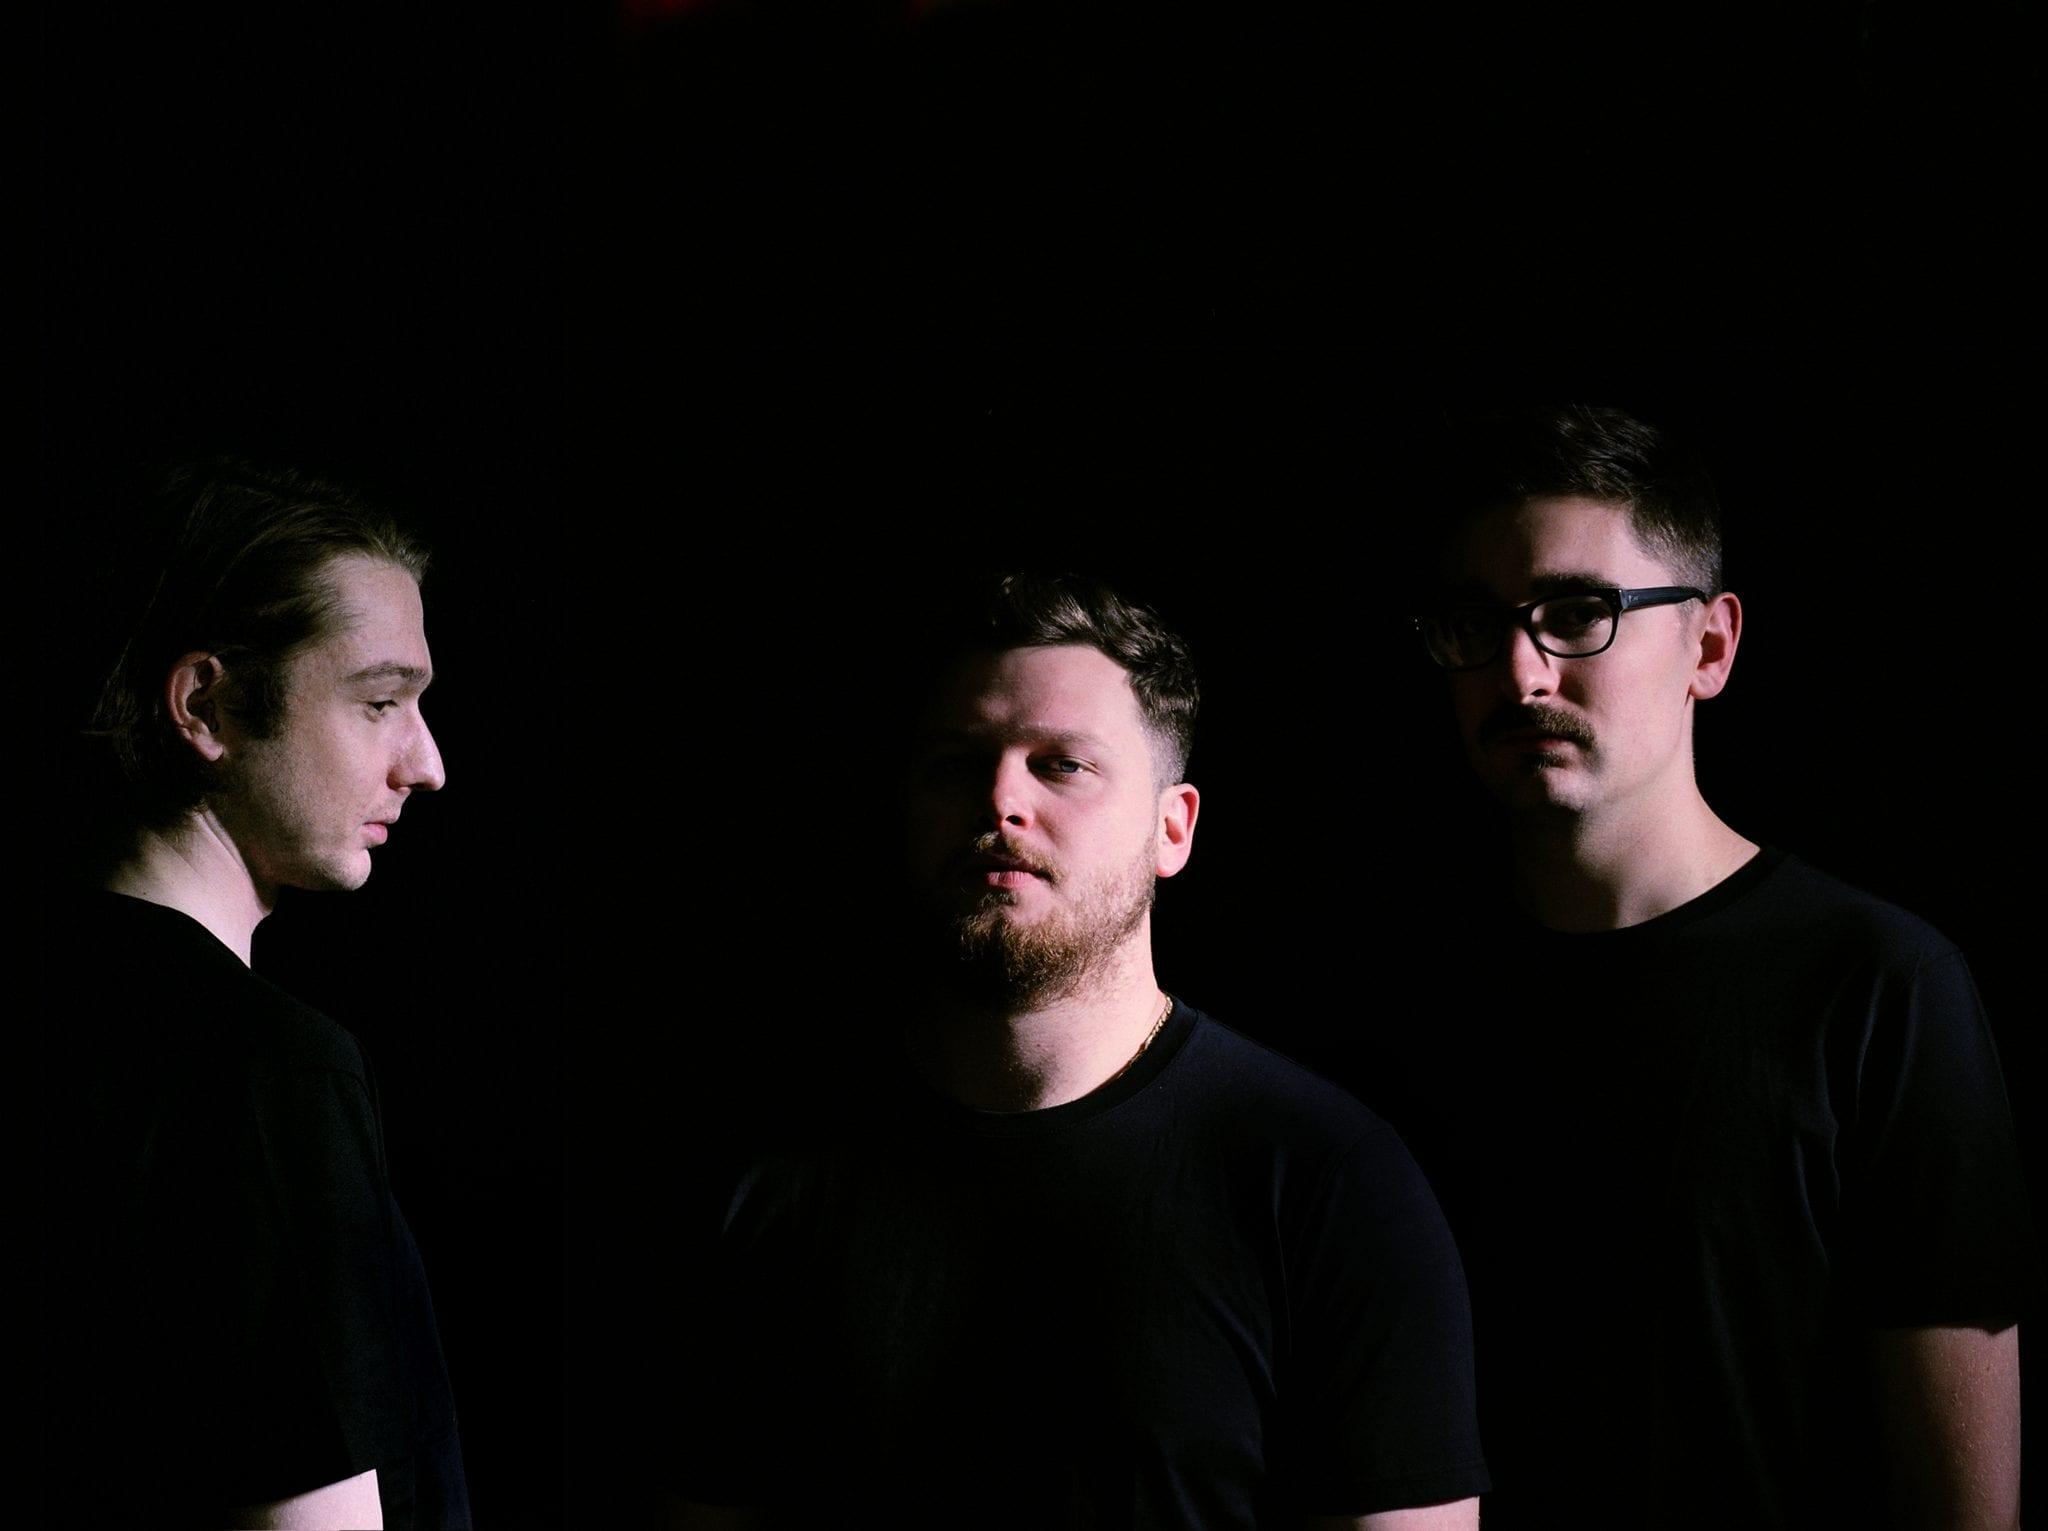 Live Review: alt-J // The SSE Hydro, Glasgow 07.12.15